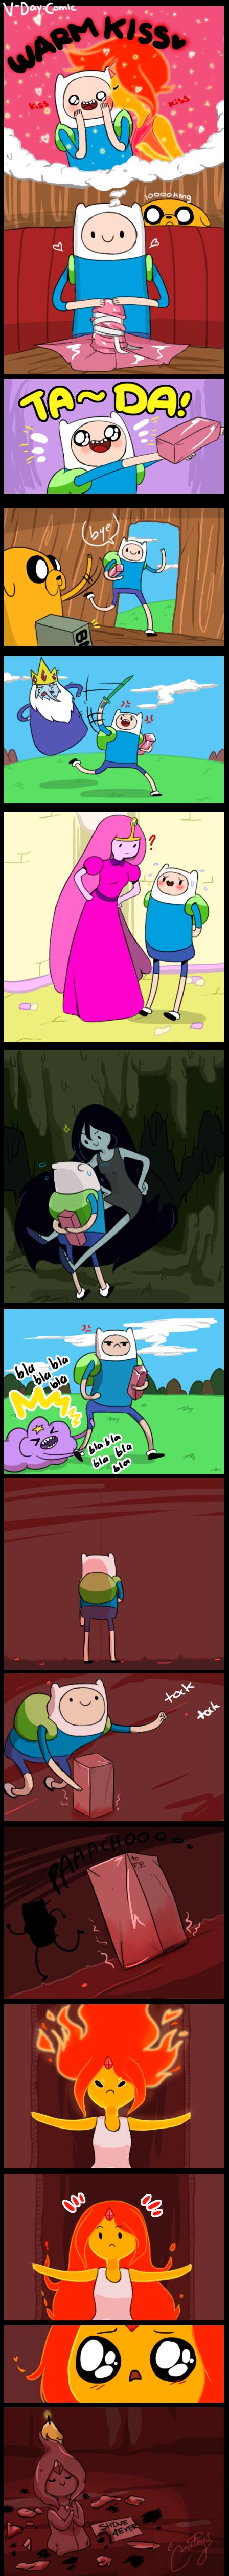 Adventure Time Princess Day minicomic: finn x flame princess v-day | adventure time